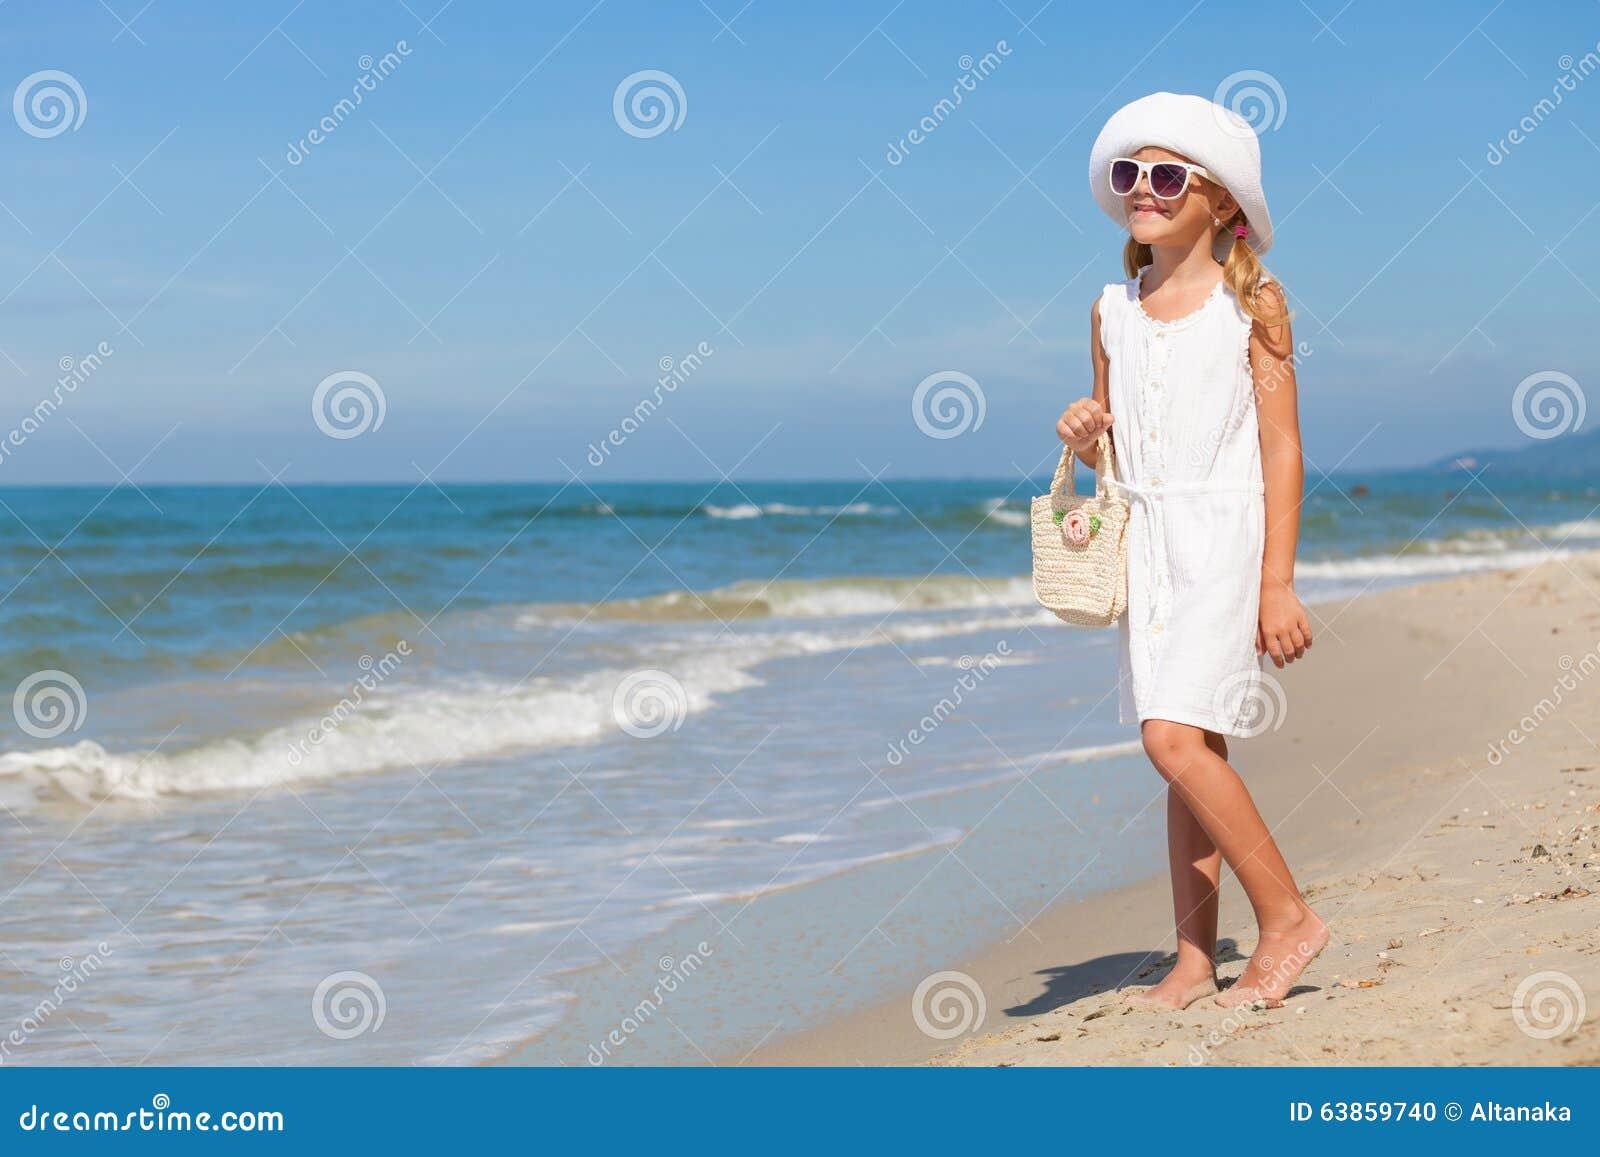 Little Girl Standing On The Beach - 104.0KB